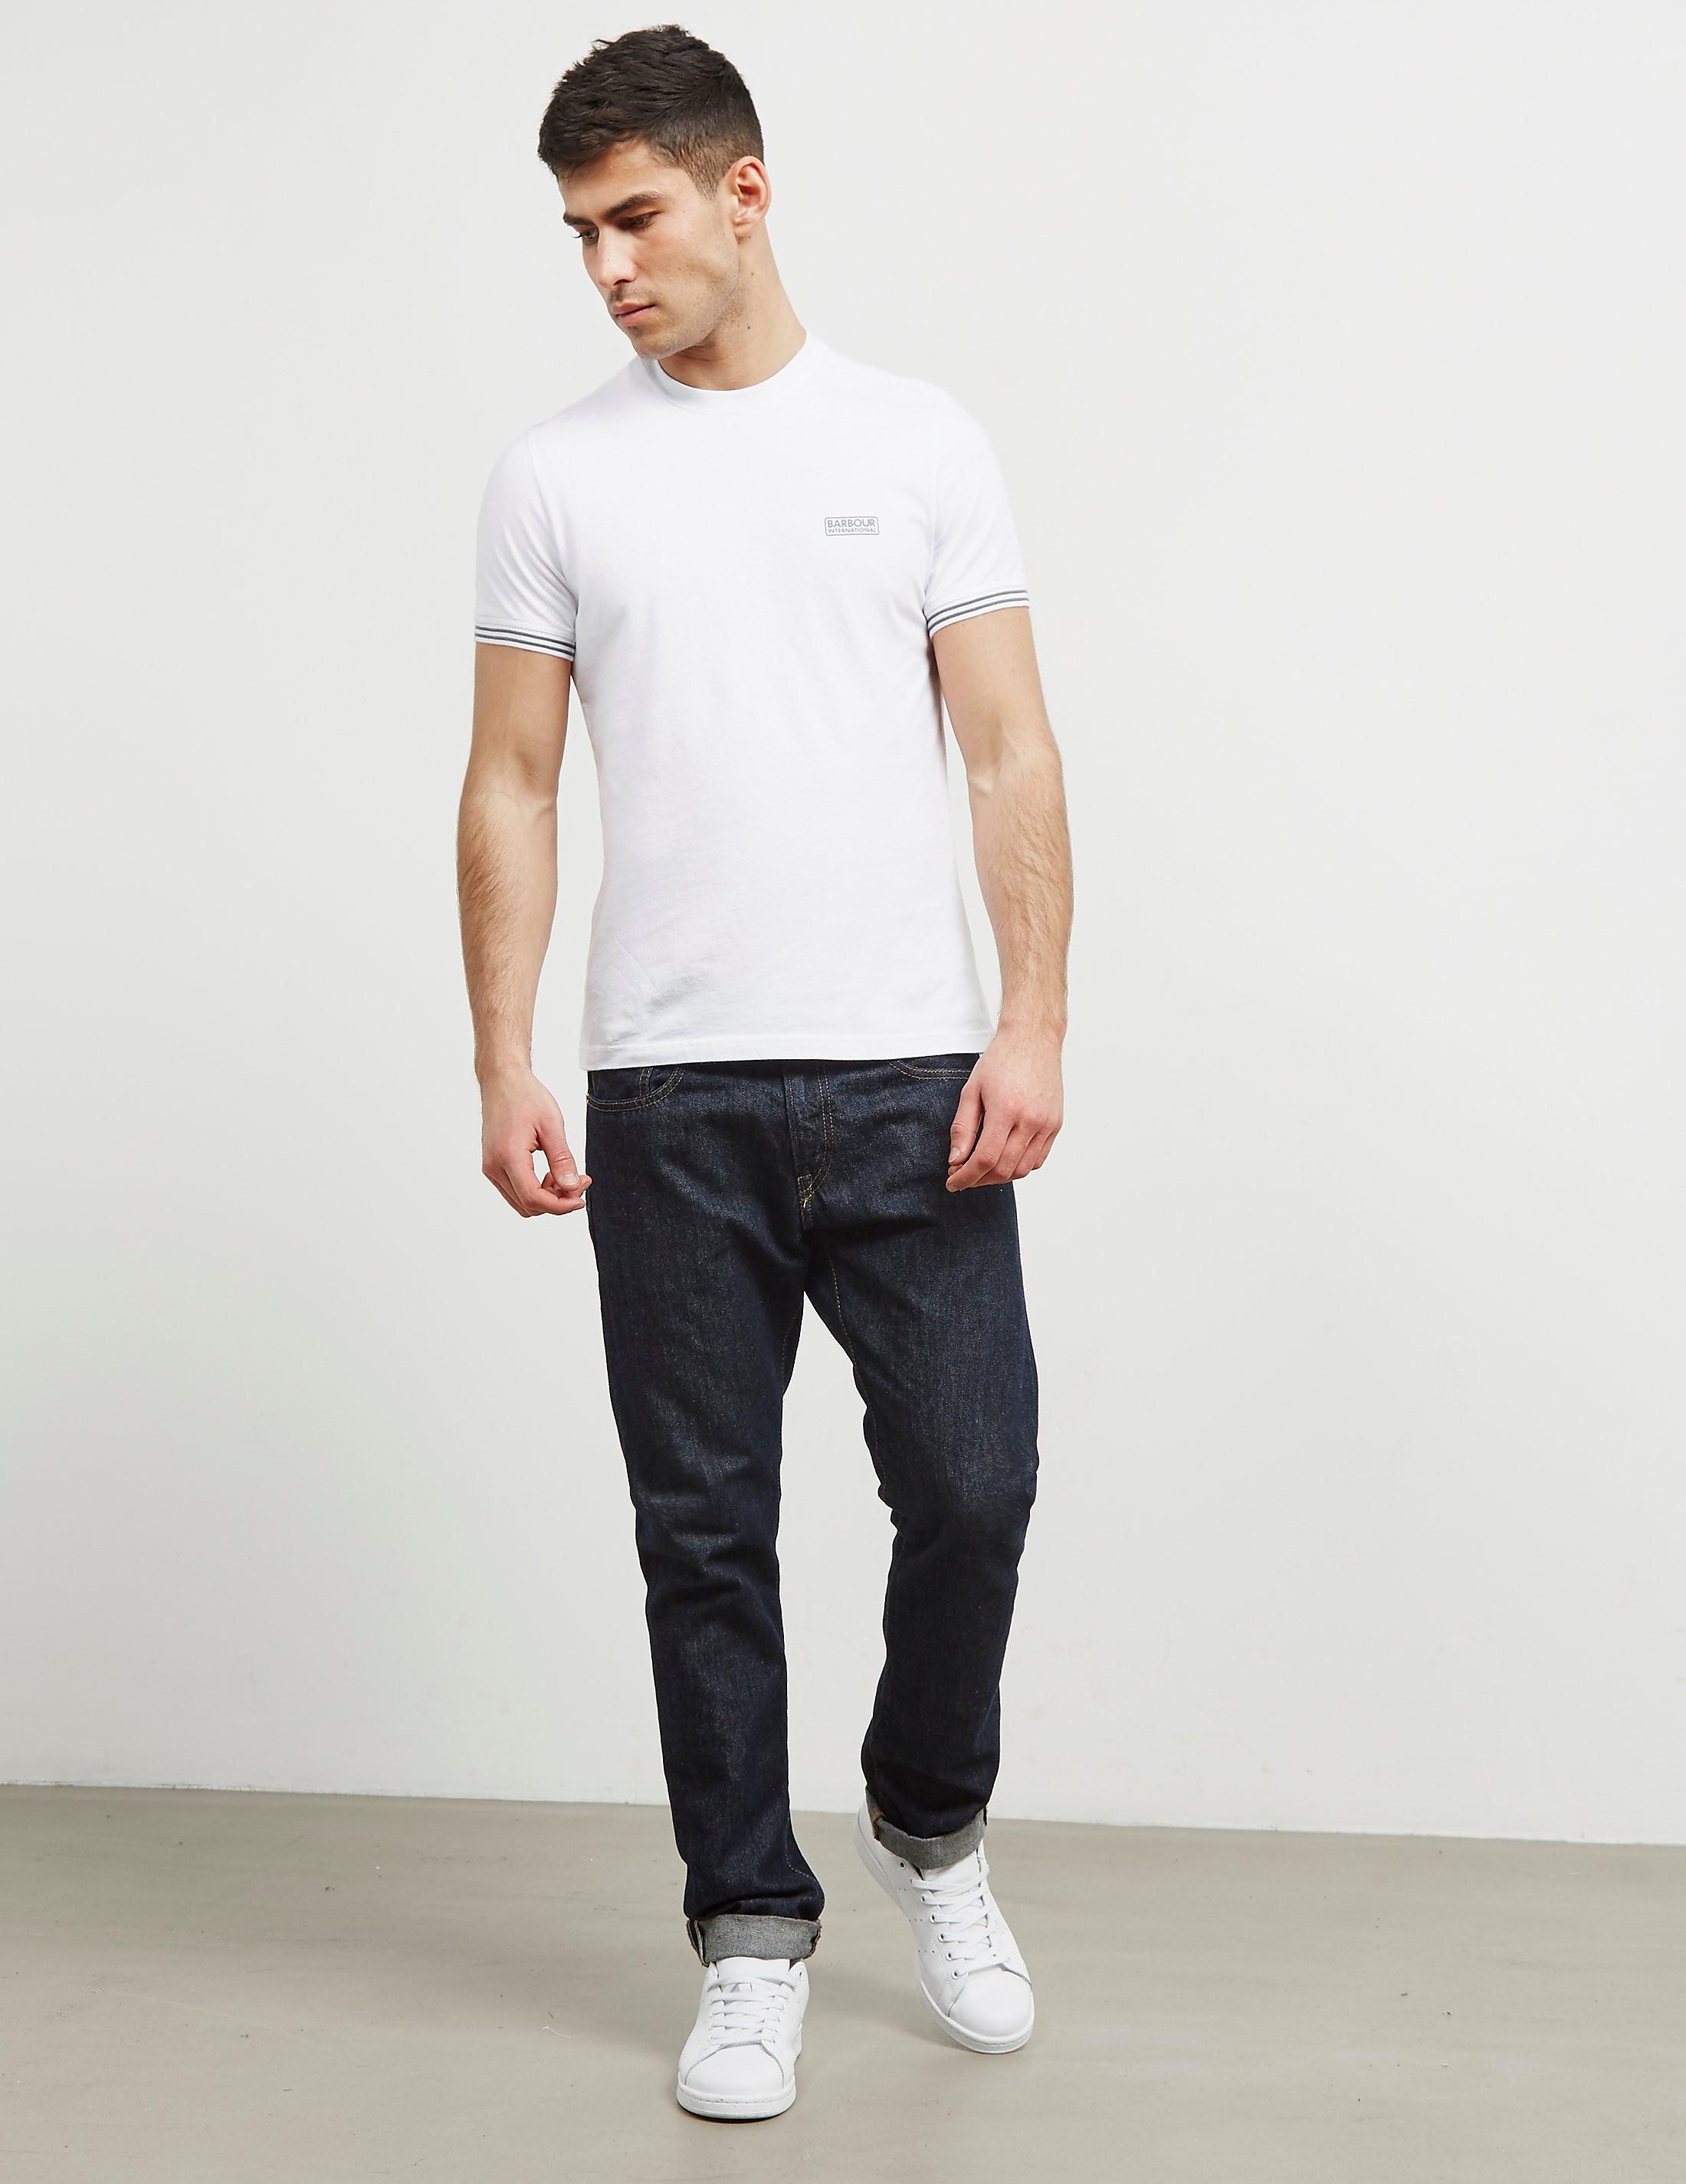 Barbour International Tipped Short Sleeve T-Shirt